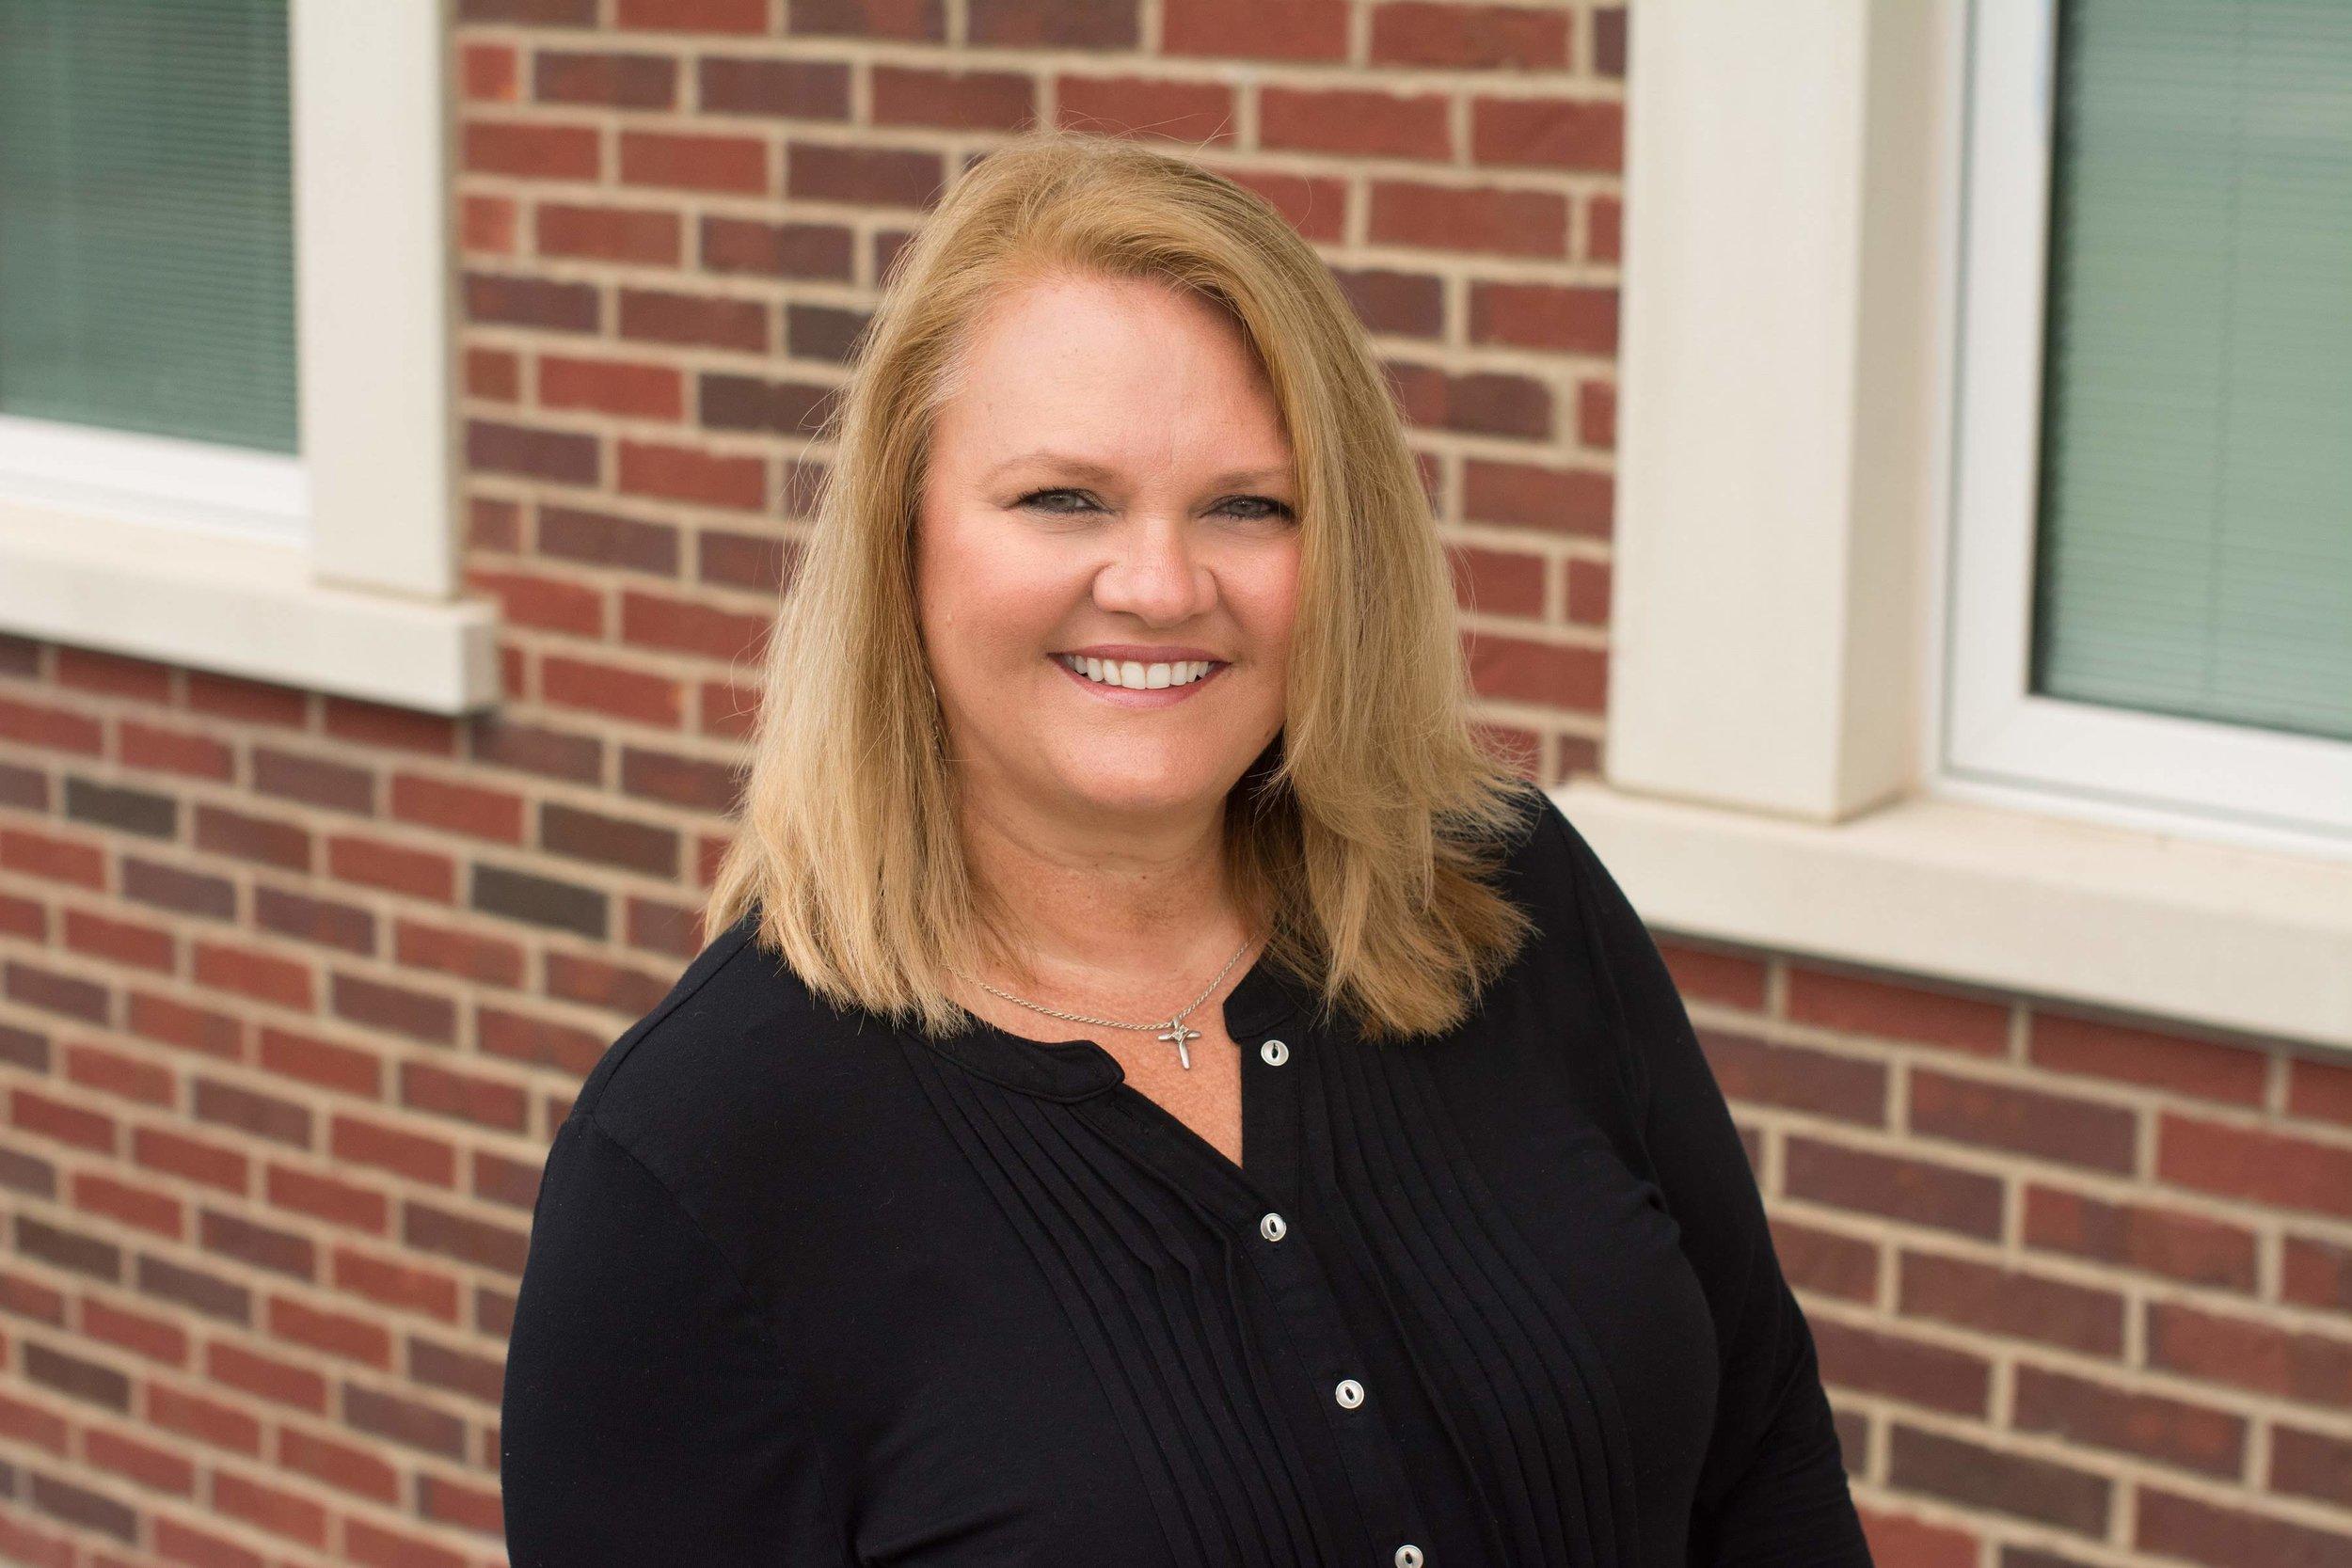 Rachel - Registered Dental Assistant